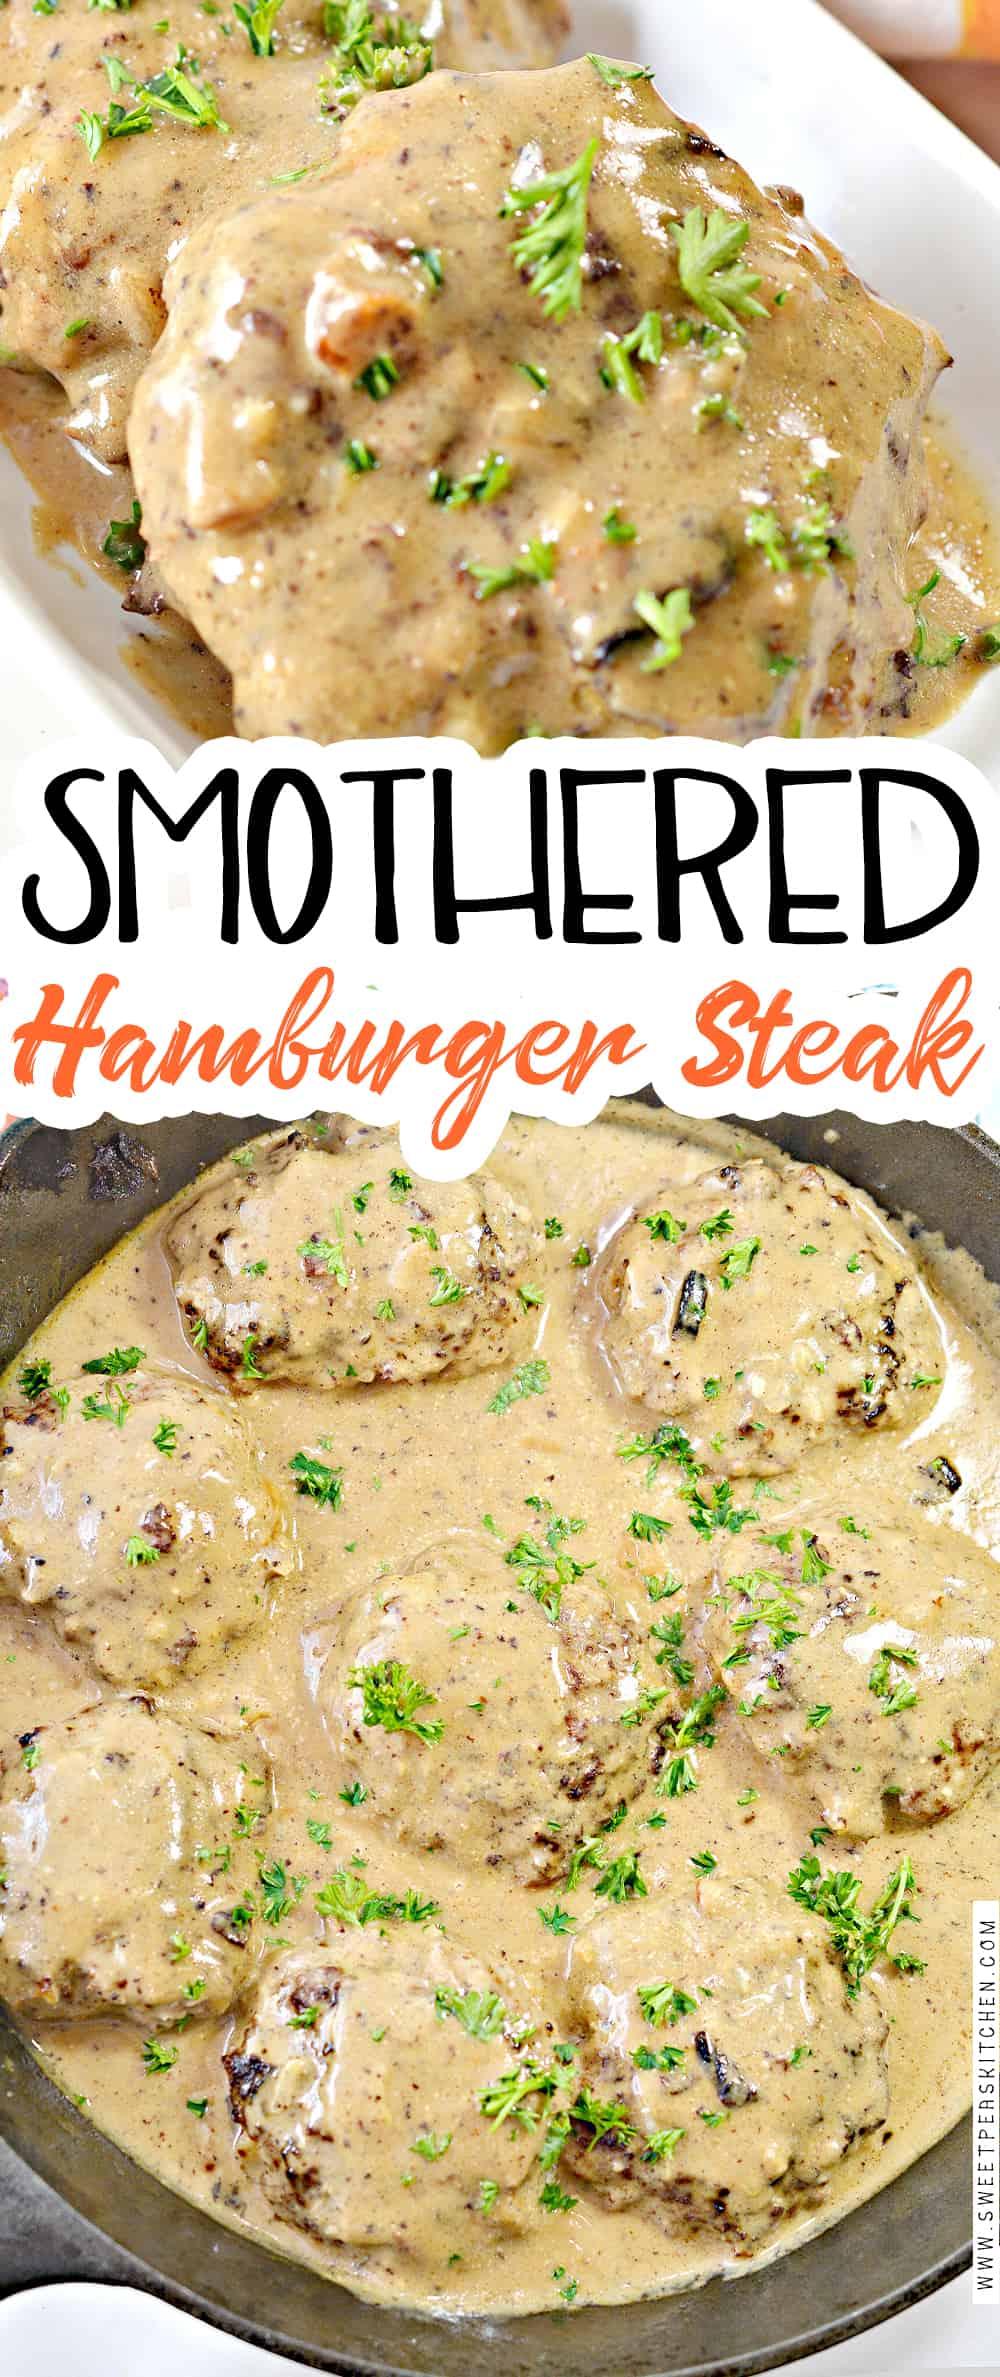 Smothered Hamburger Steak